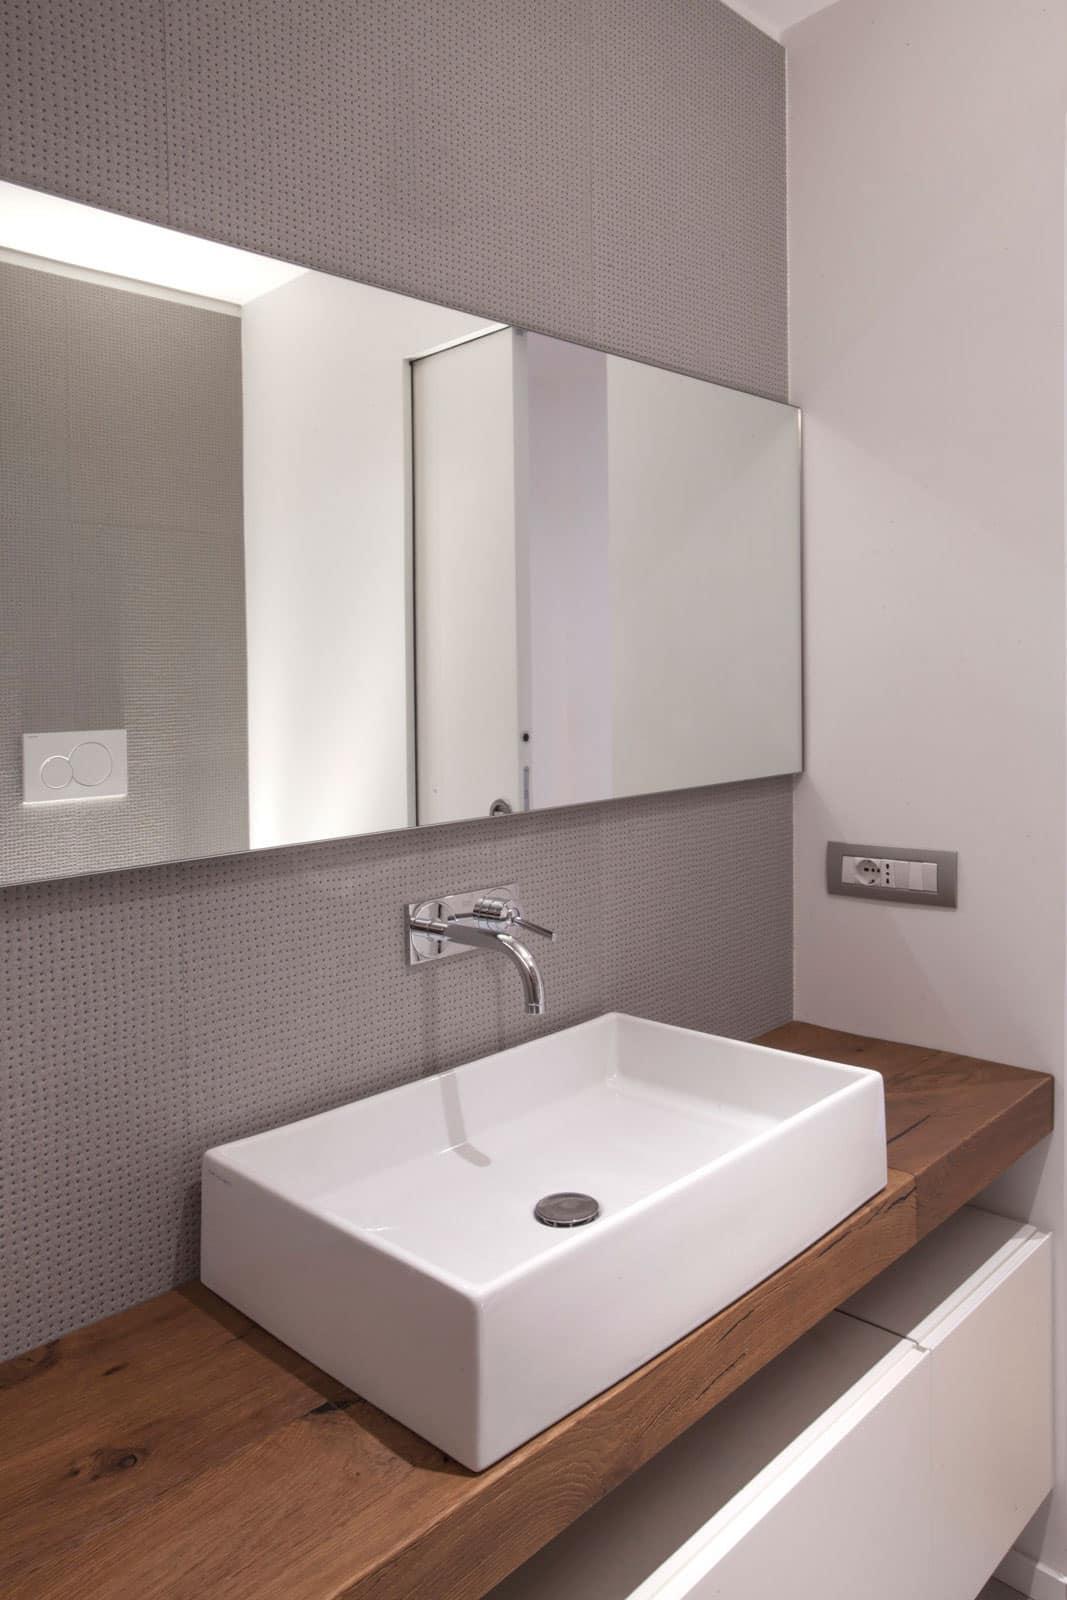 Mariella's Apartment by Luca Peralta Studio (11)